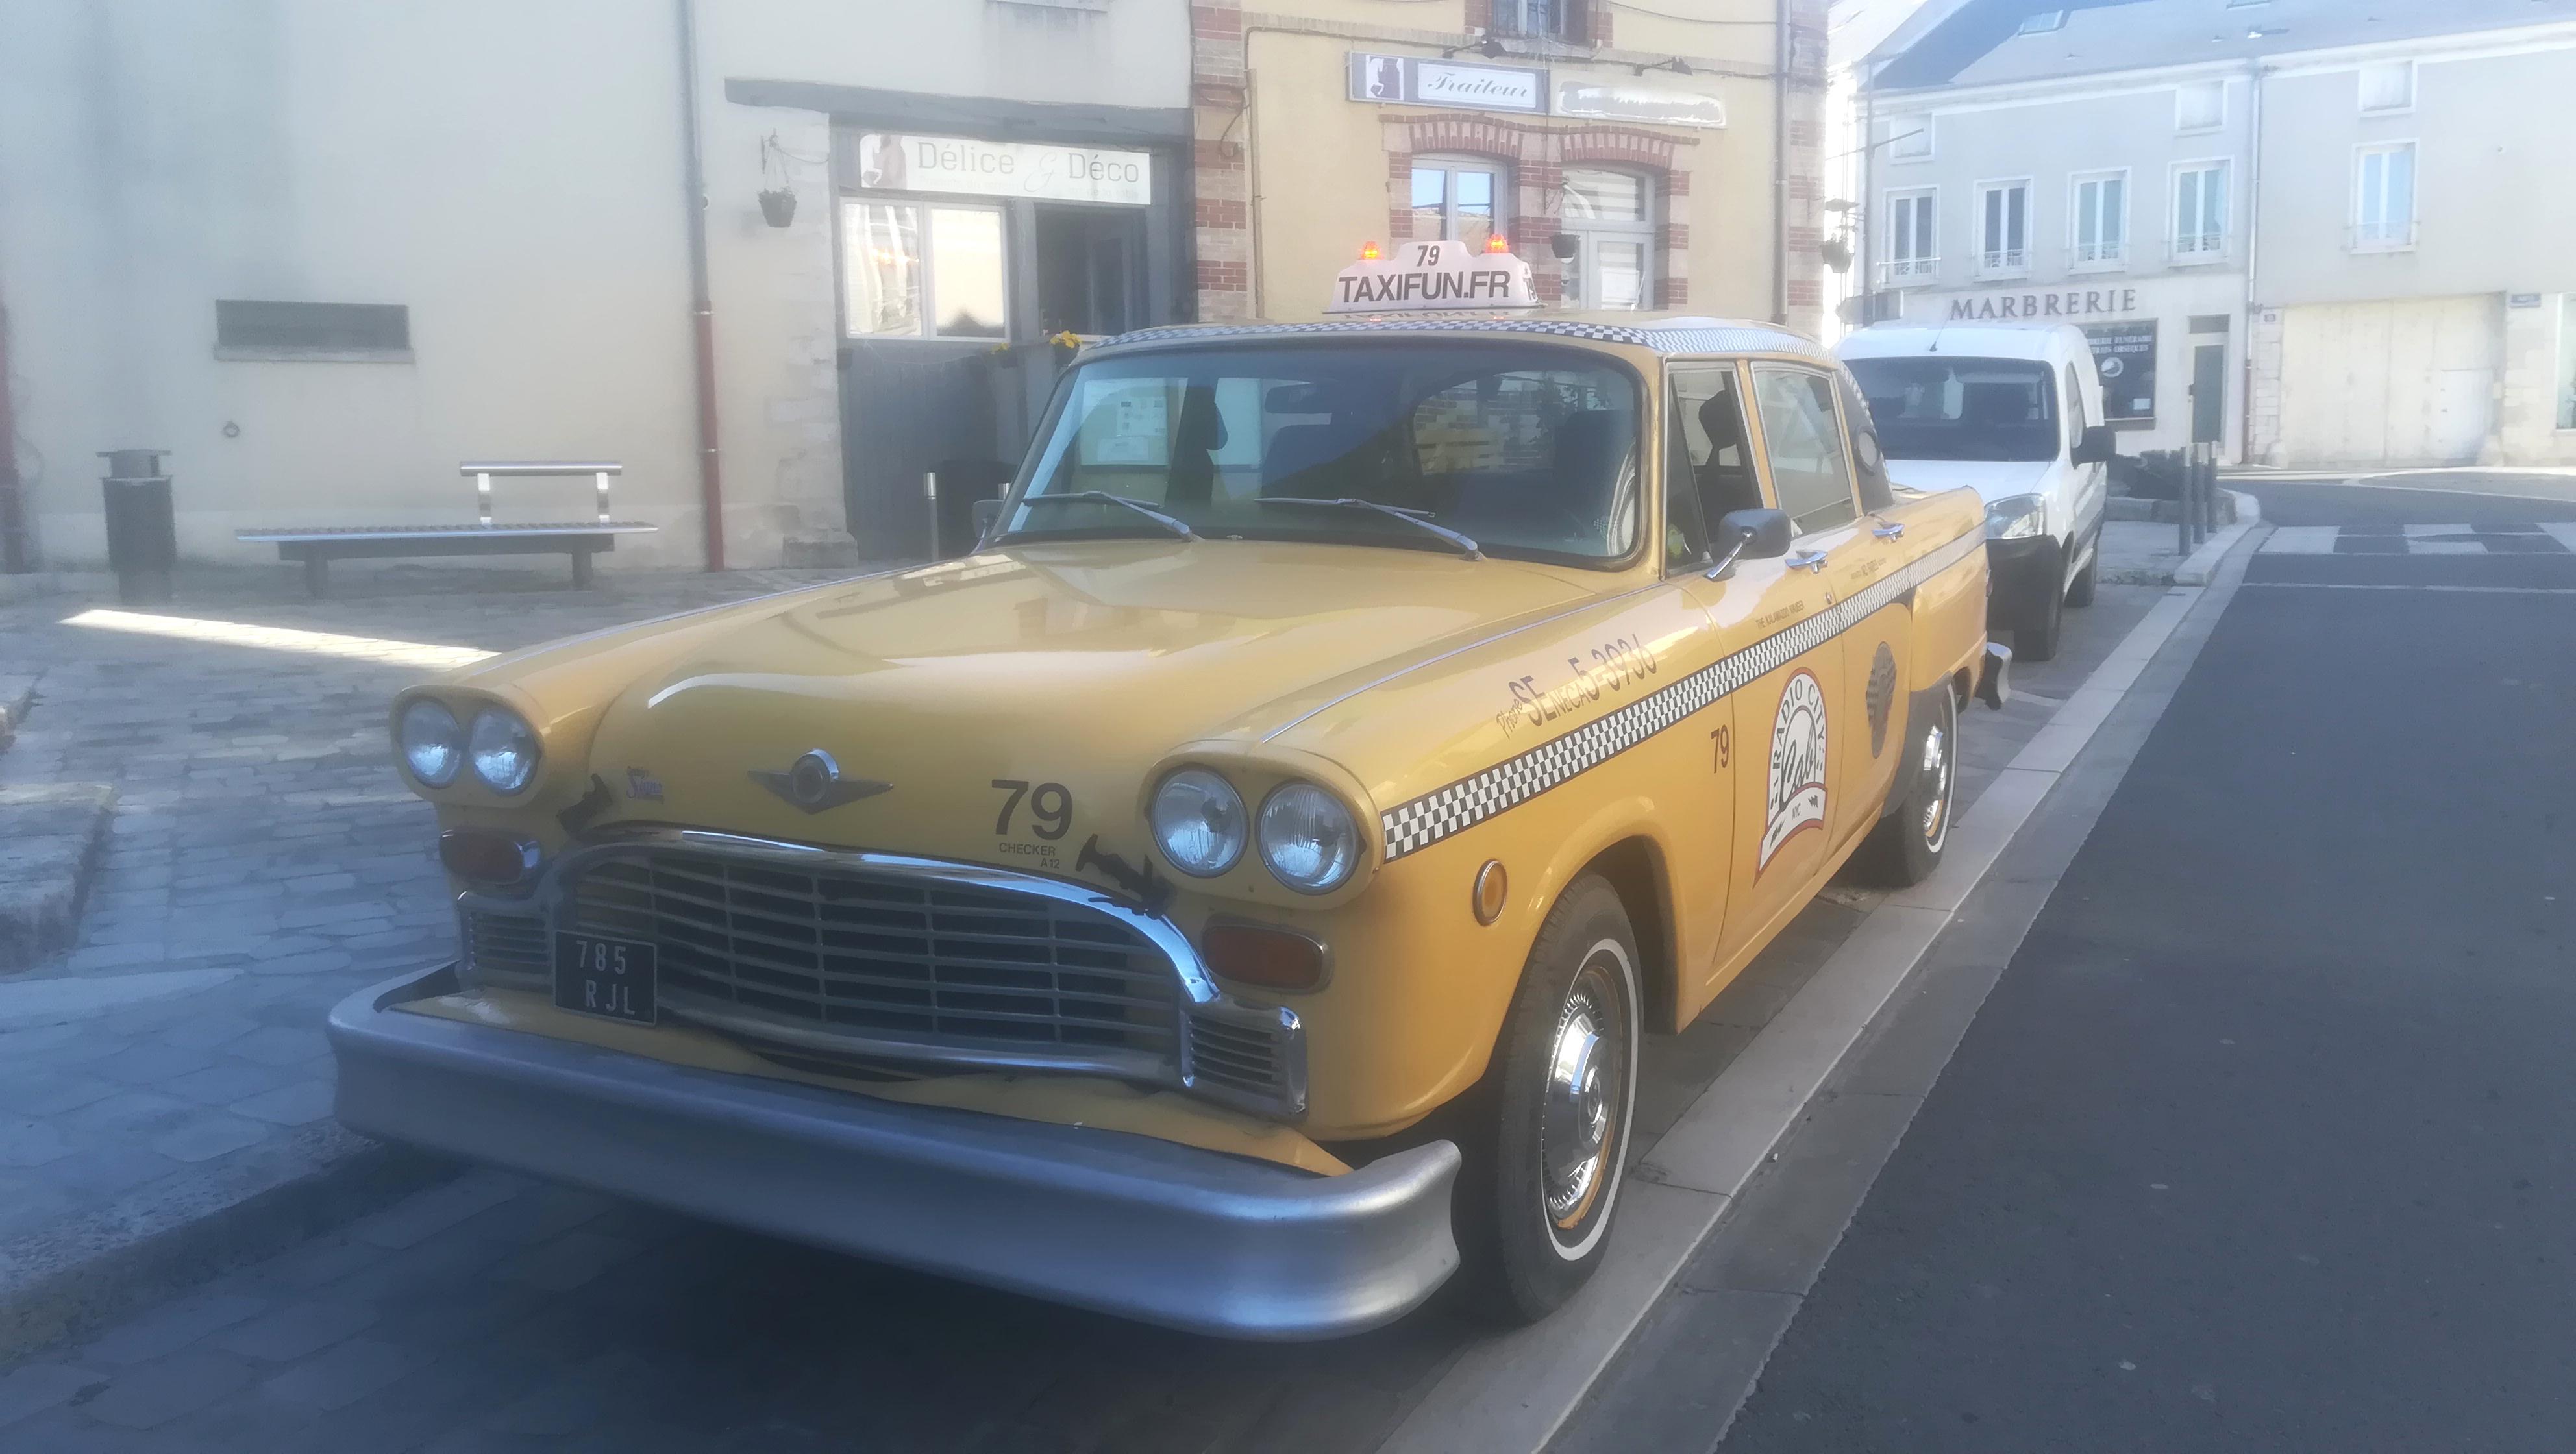 taxi new yorkais yellow cab avec chauffeur voiture de mariage wedding mariage evenement